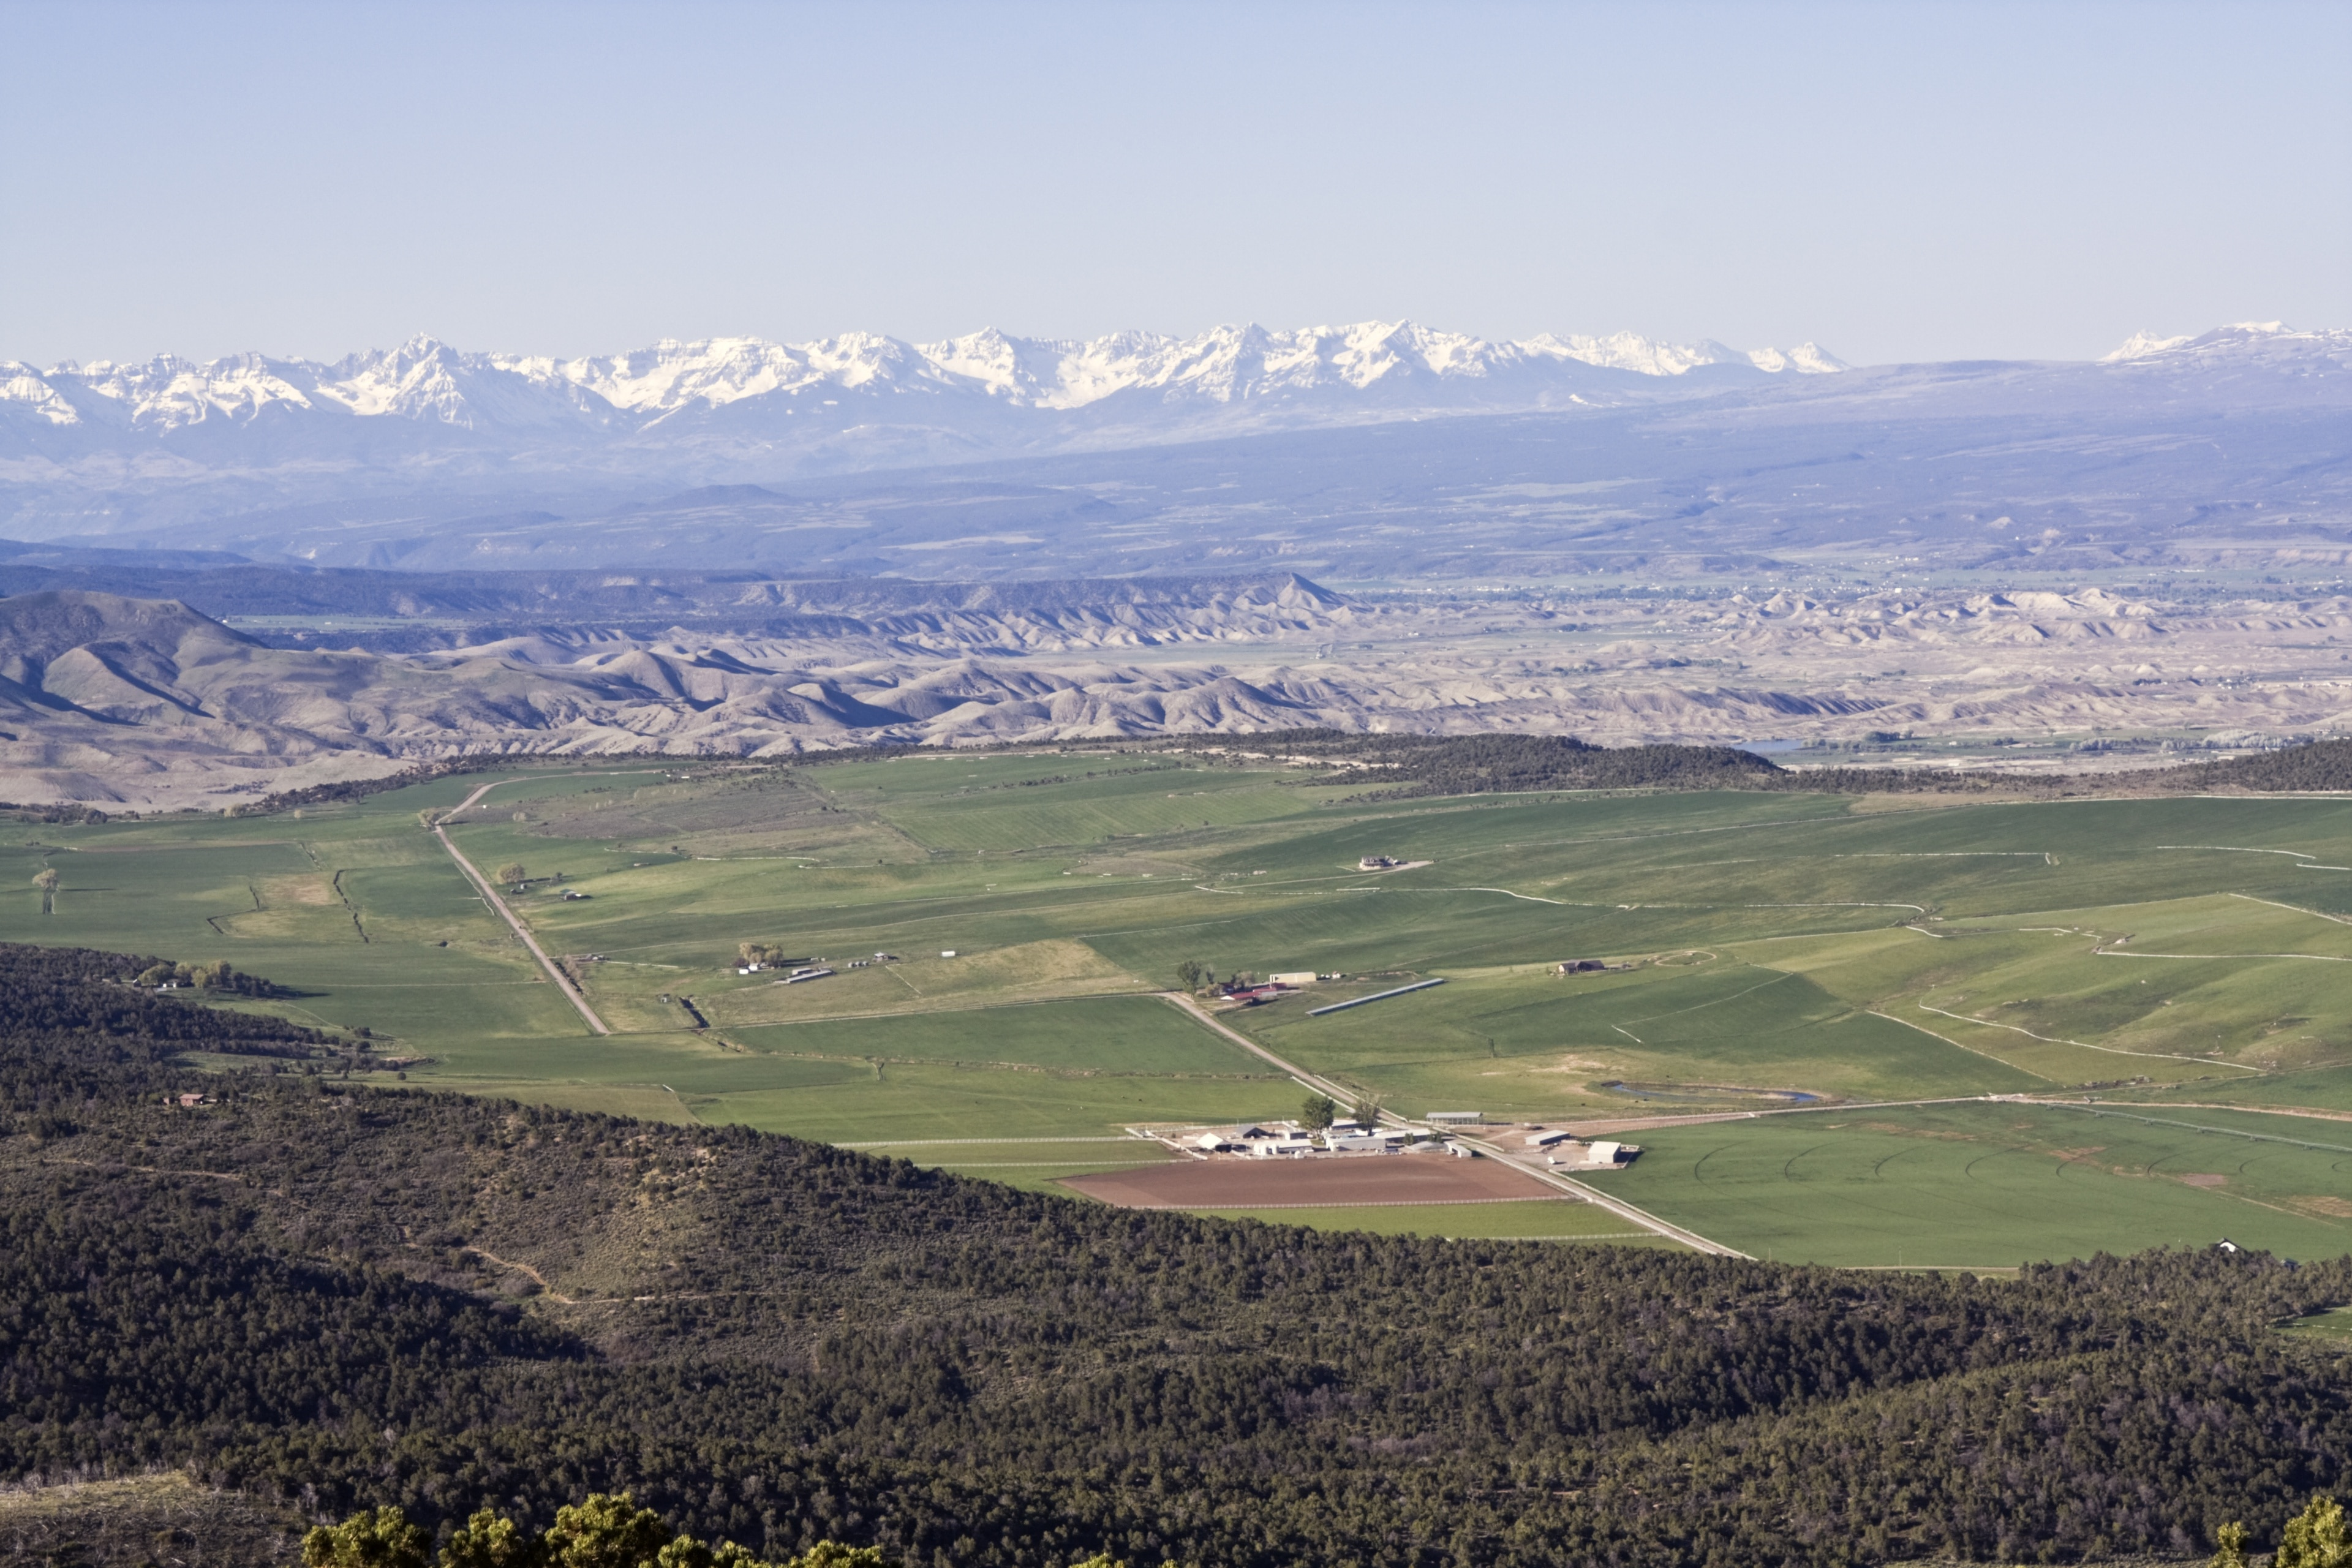 Gunnison, Colorado, United States of America